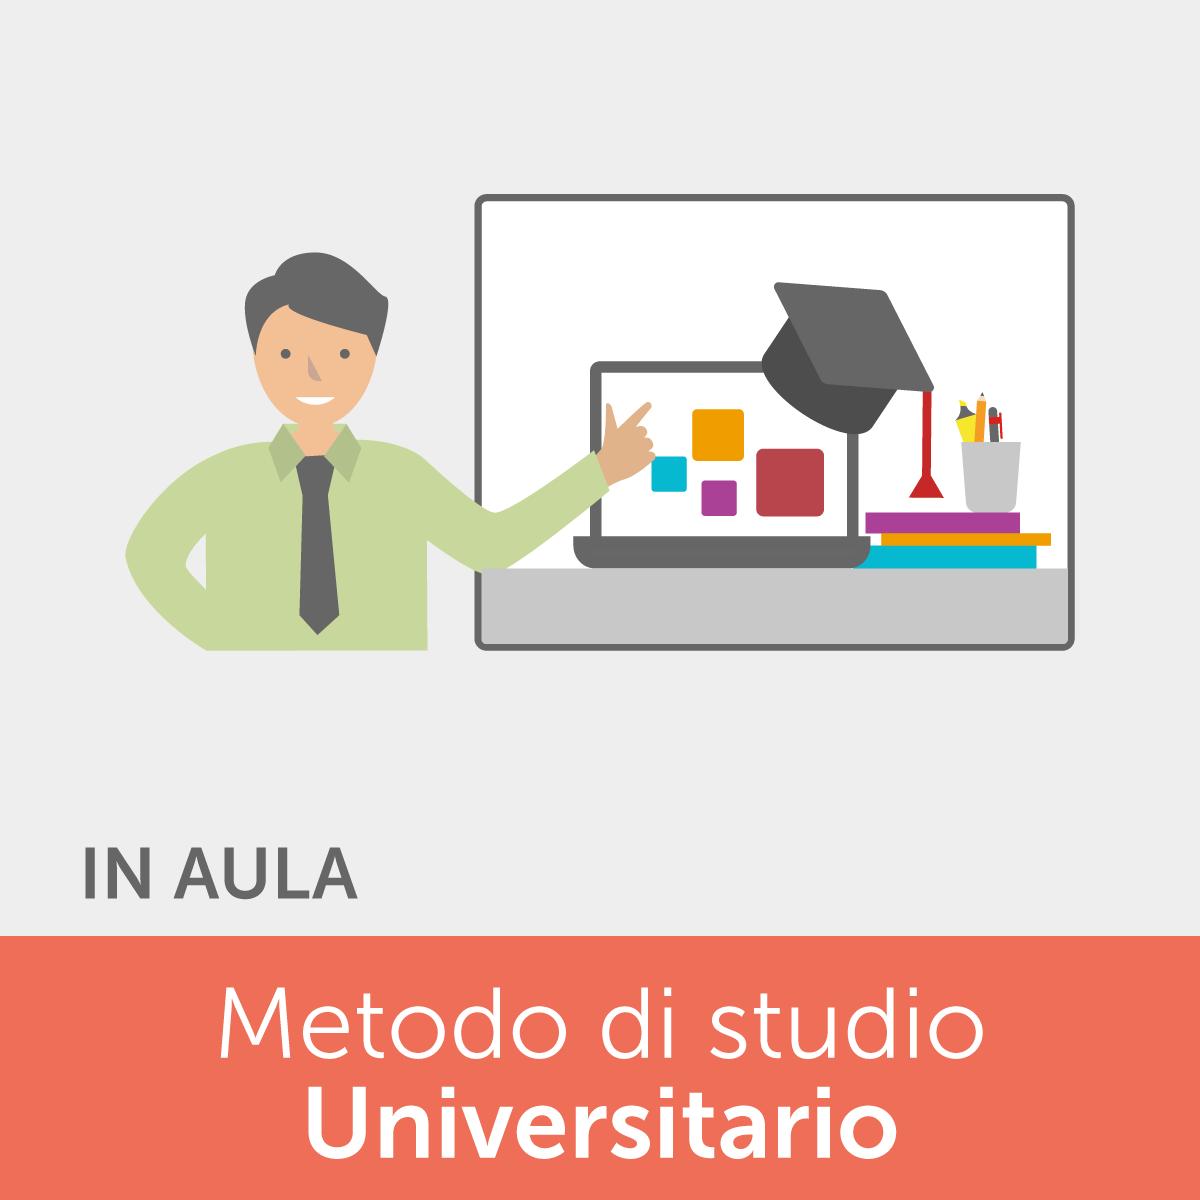 Metodo di studio universitario efficace